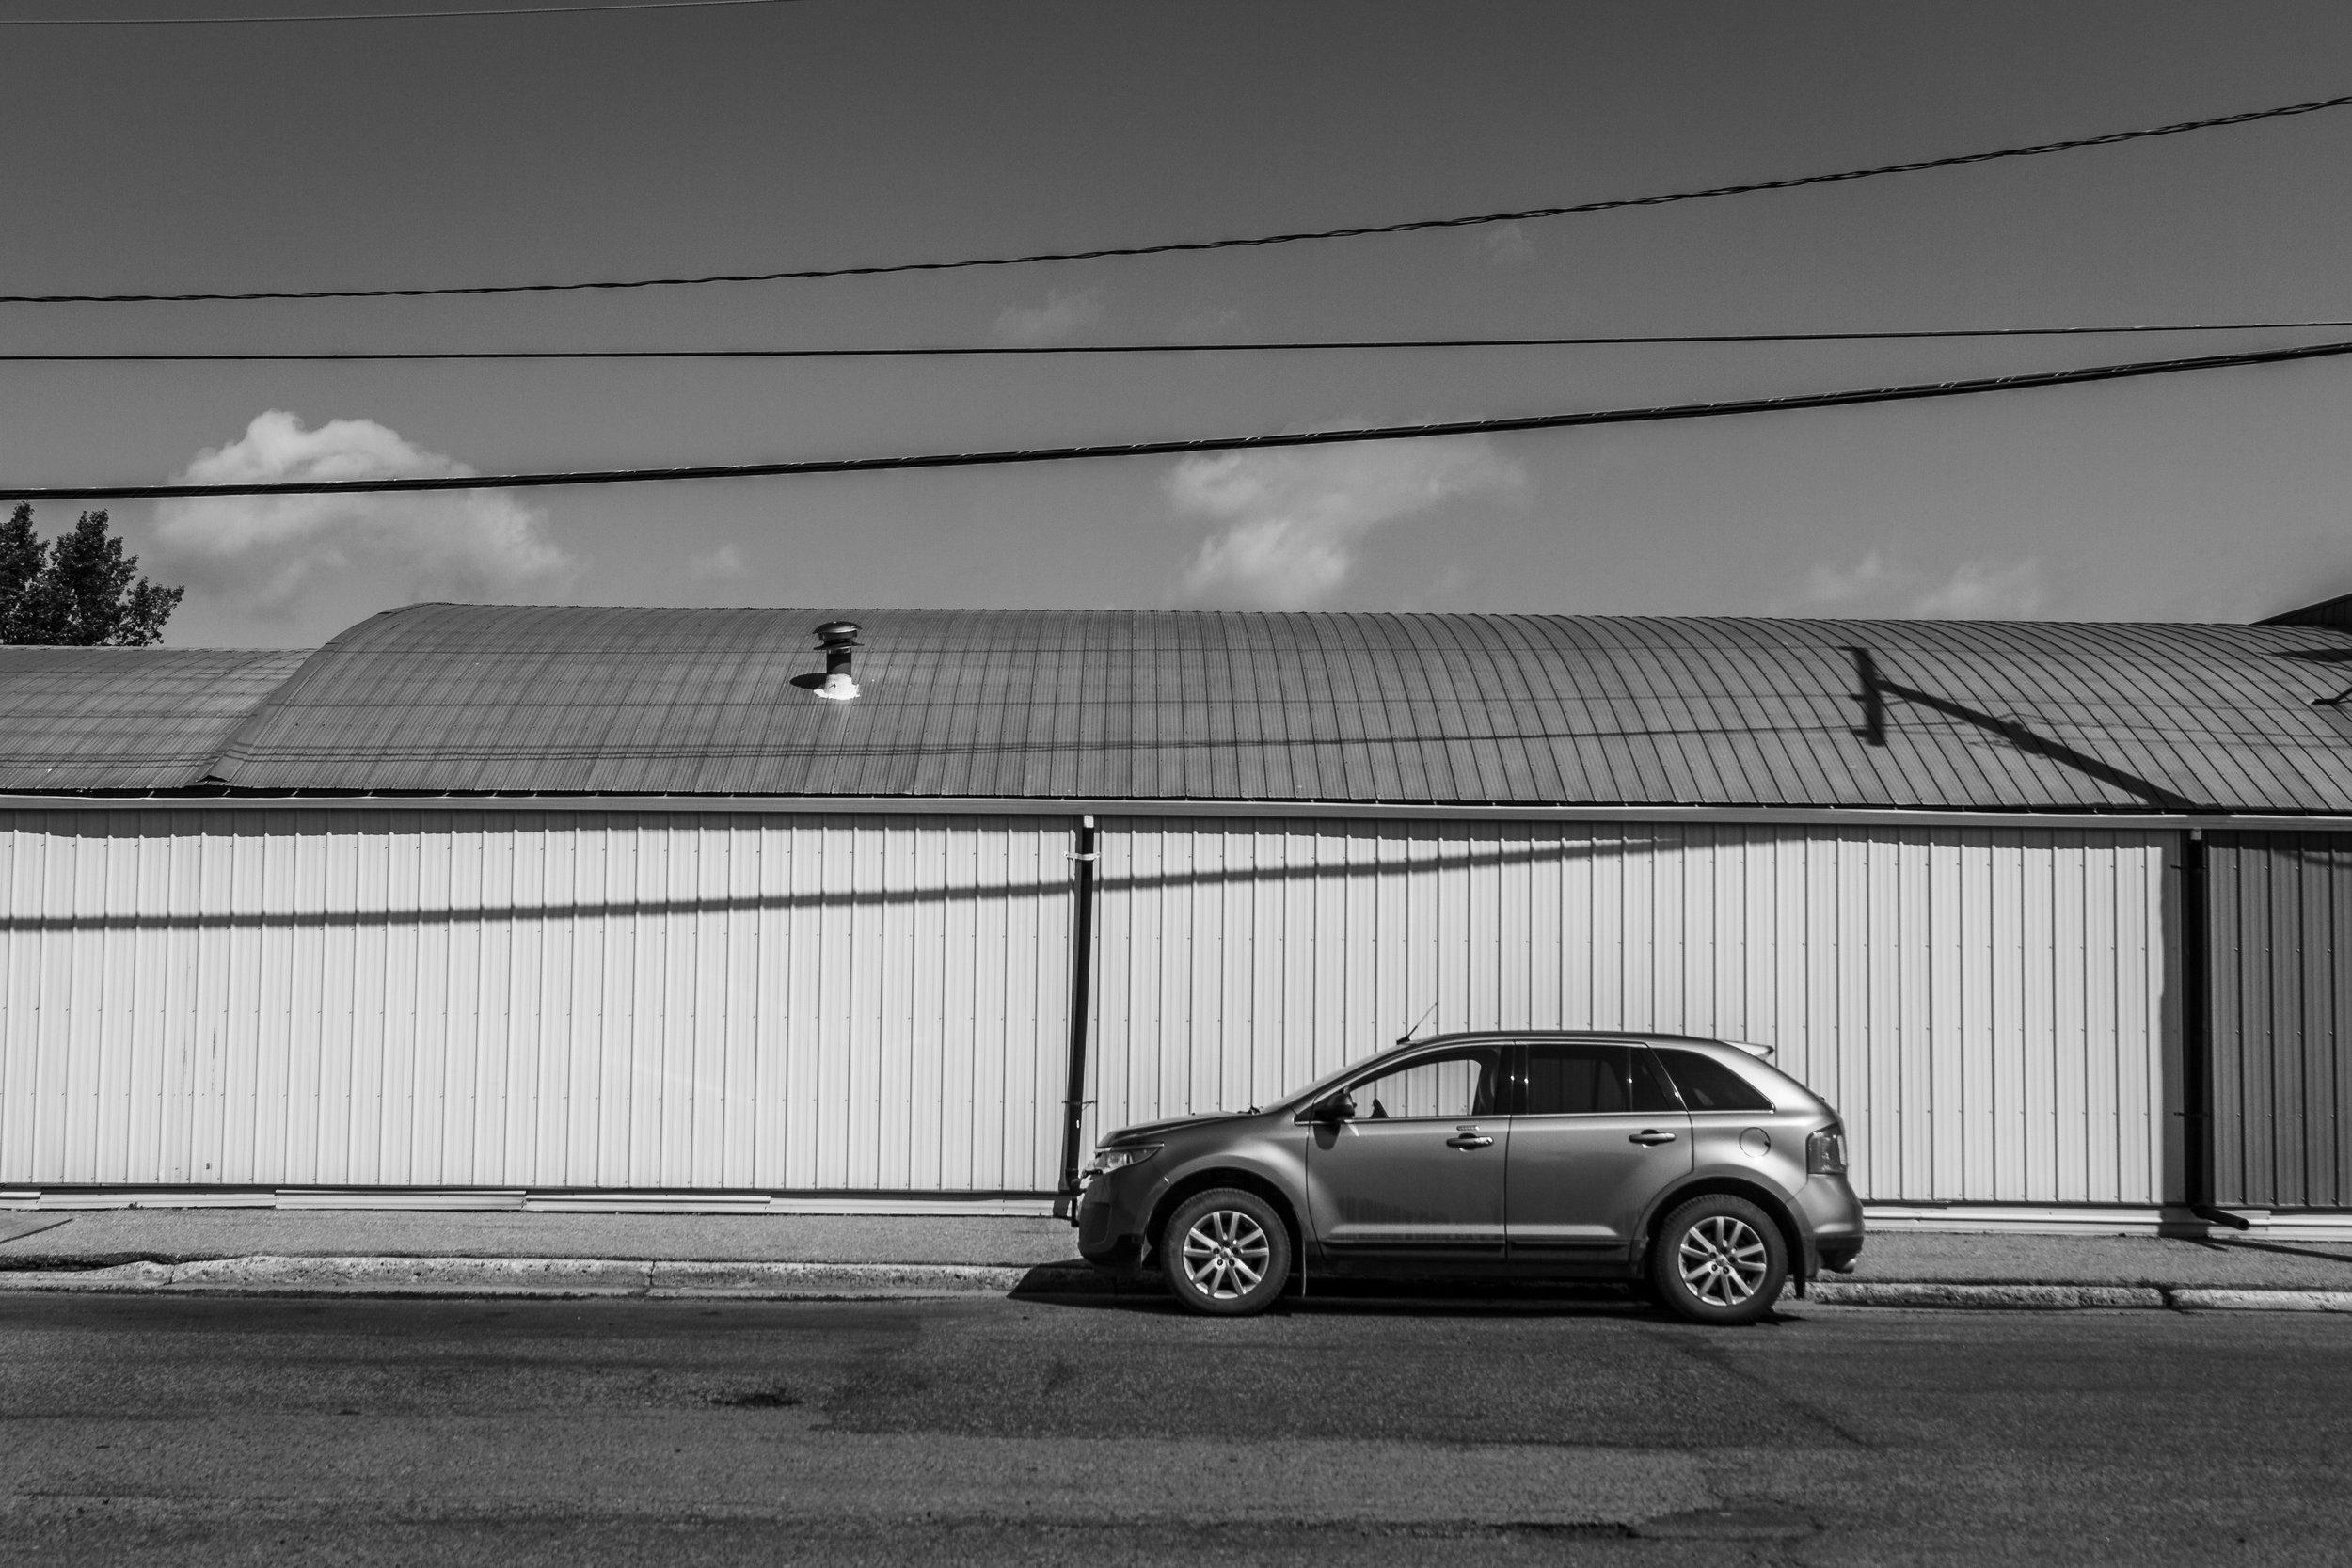 Pacific Avenue, Outlook, Saskatchewan, 2017